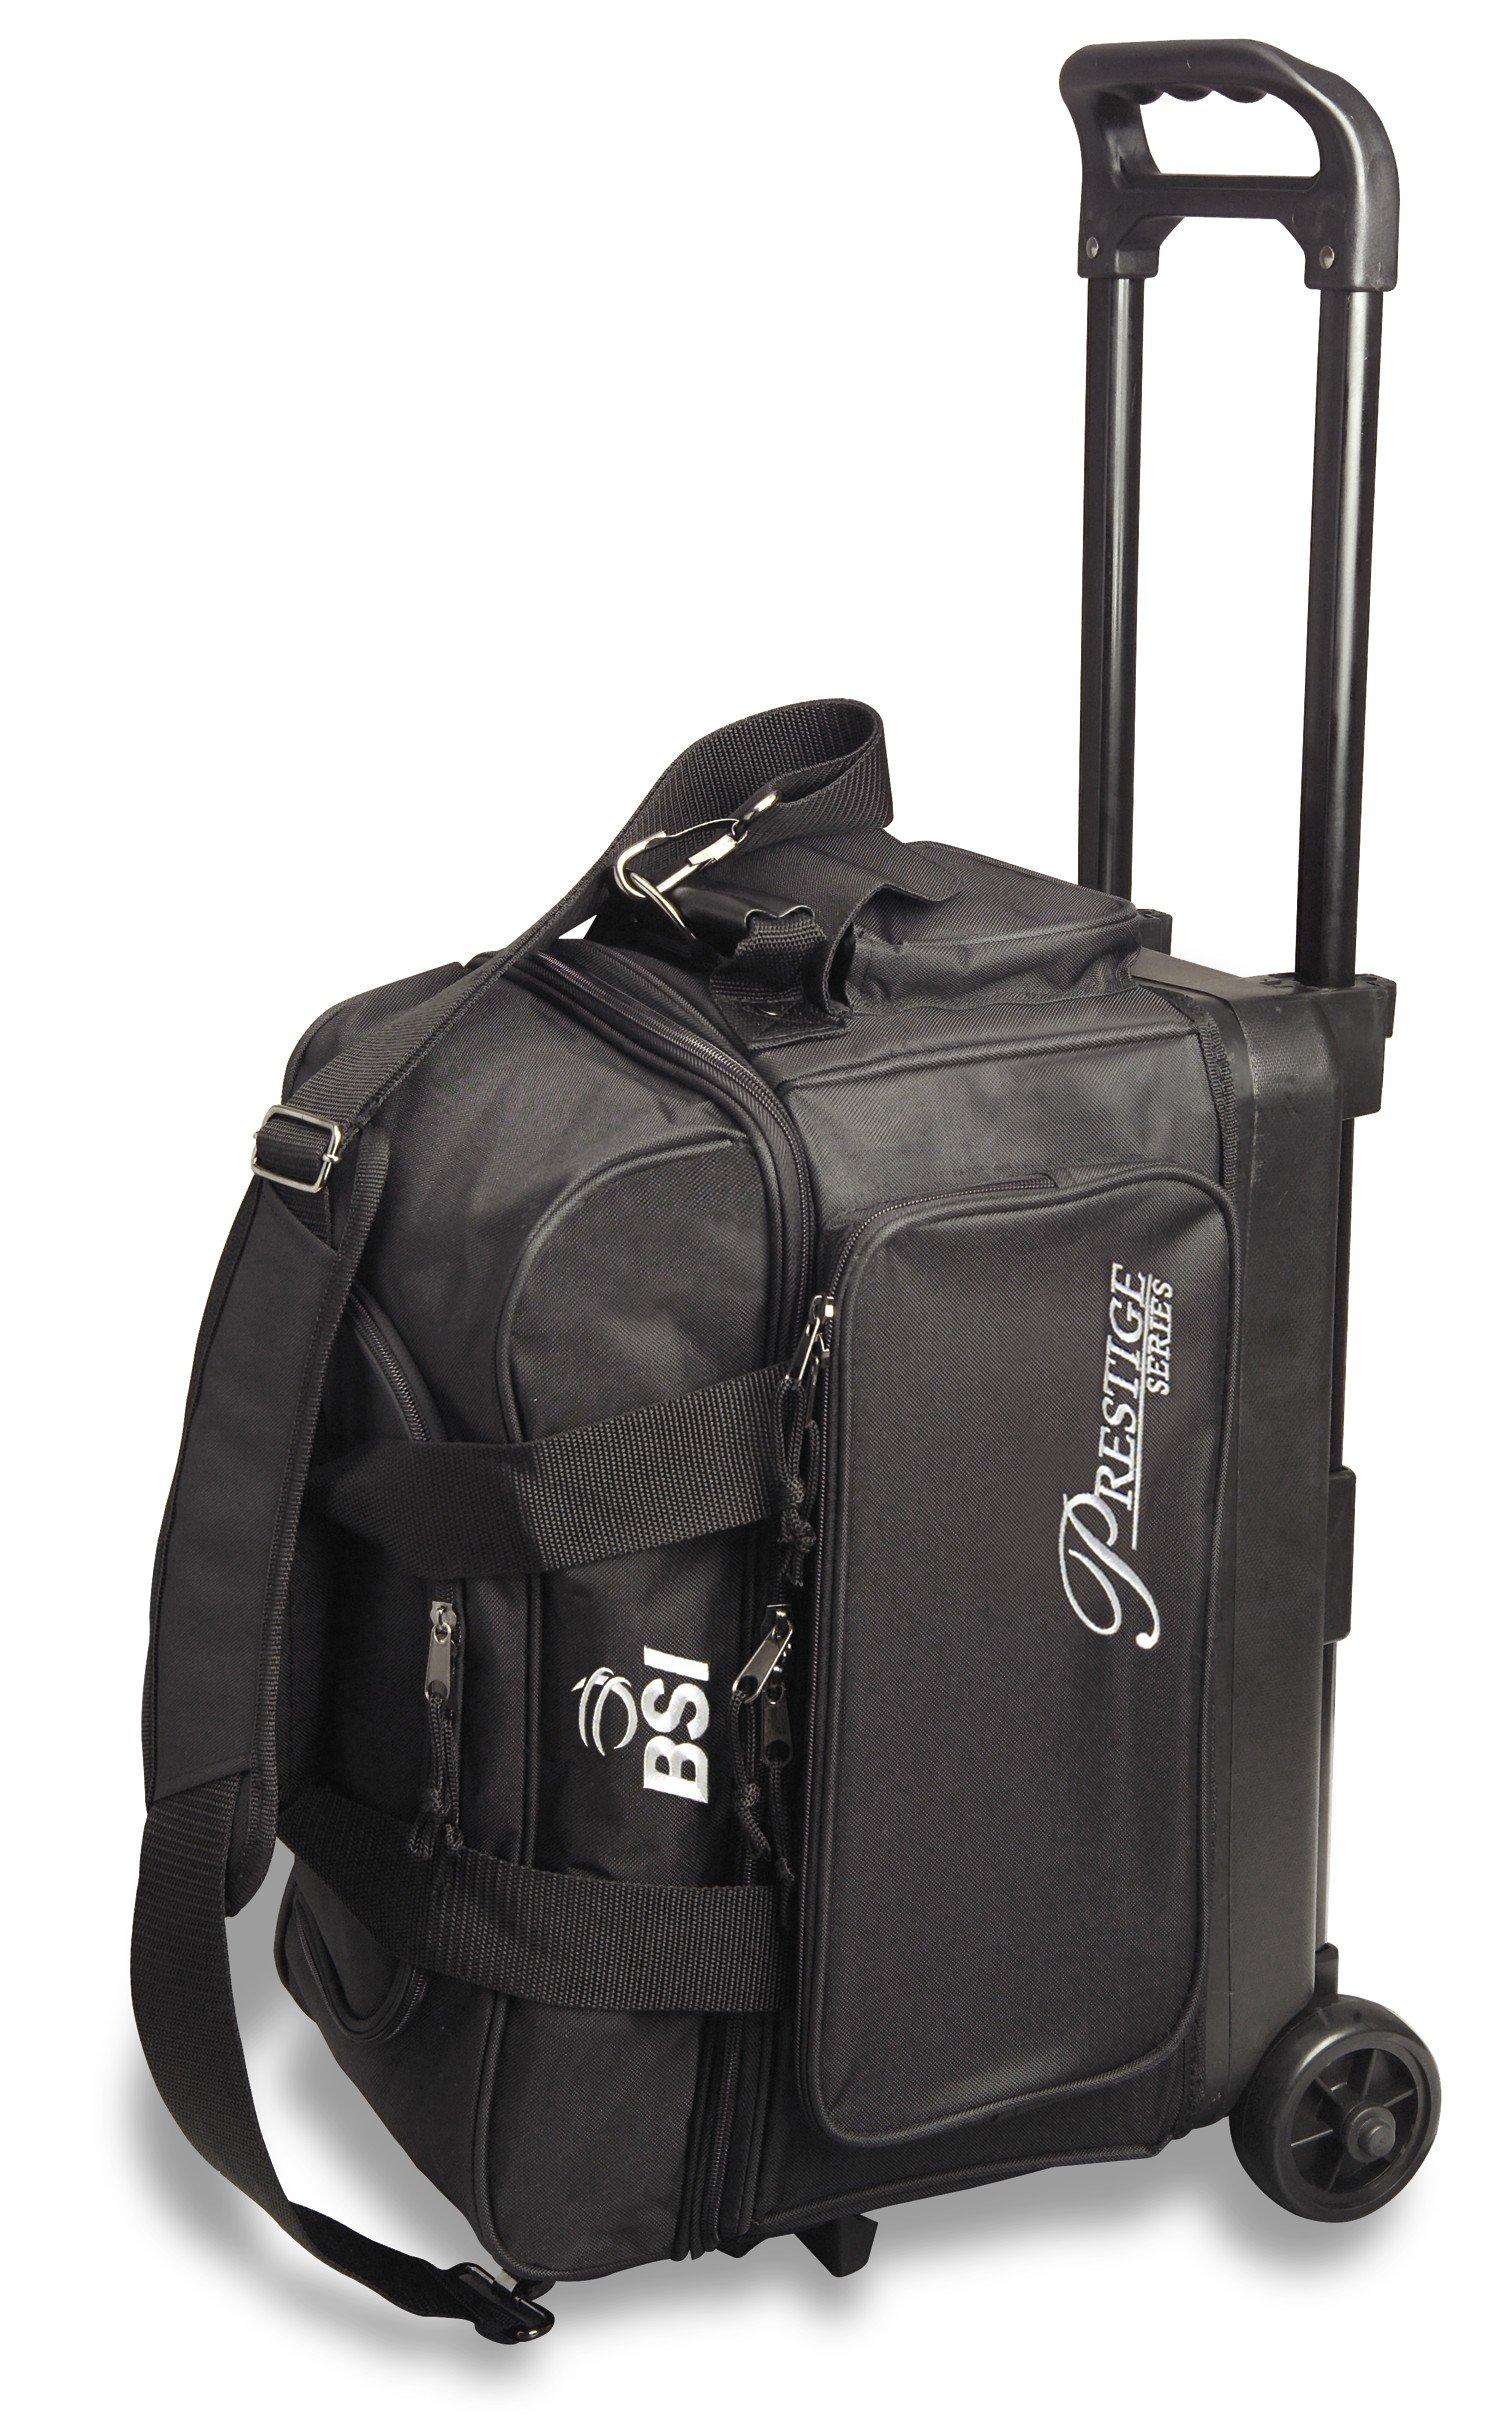 BSI Prestige Series Double Ball Roller Bag (Black/Silver Logo)